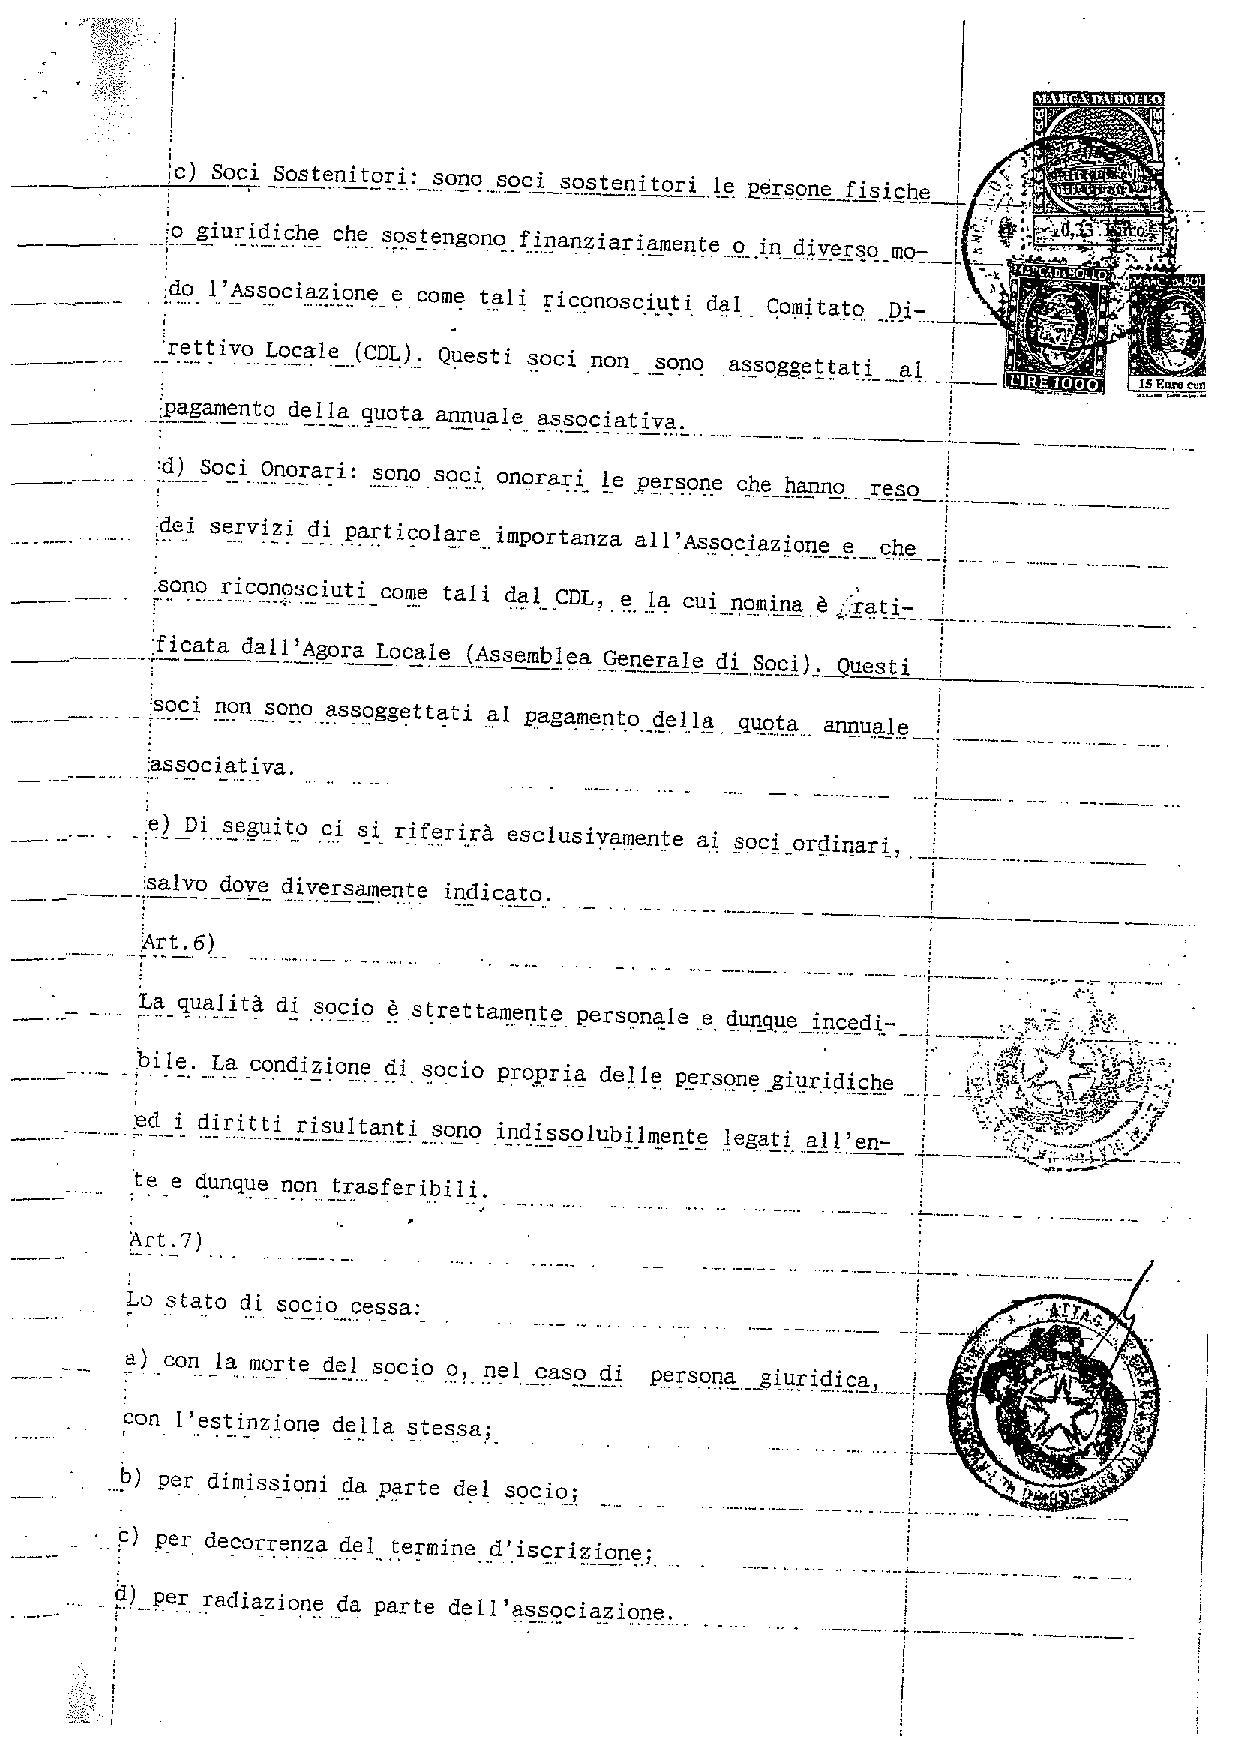 statuto-aegee-catania-page-003